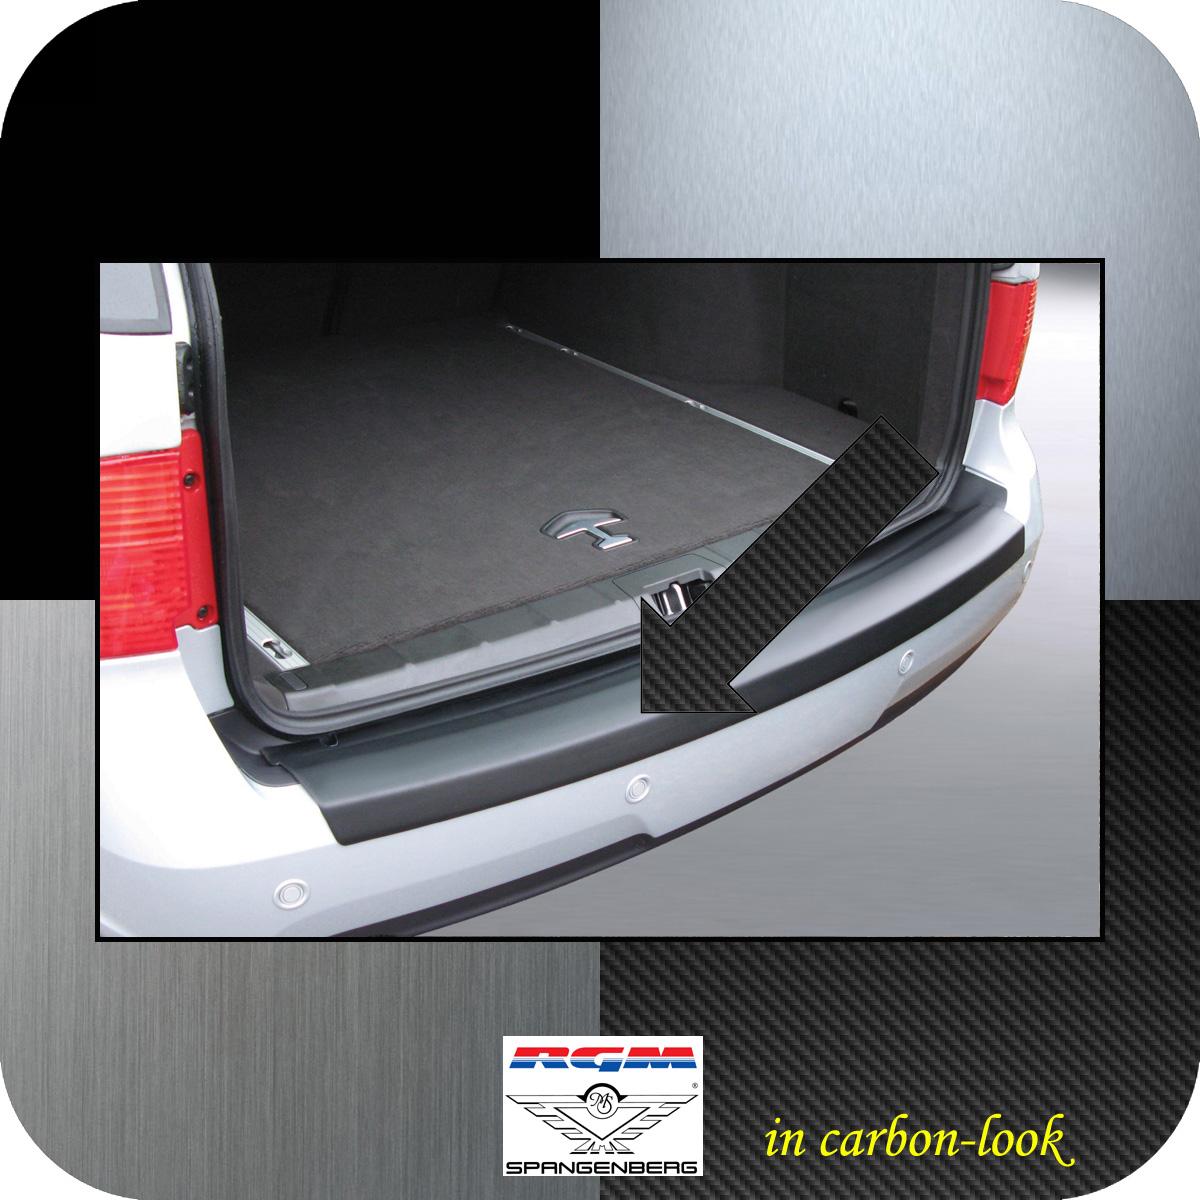 Ladekantenschutz Carbon-Look Saab 9-5 Kombi ab facelift II ab 2005-2009 3509404